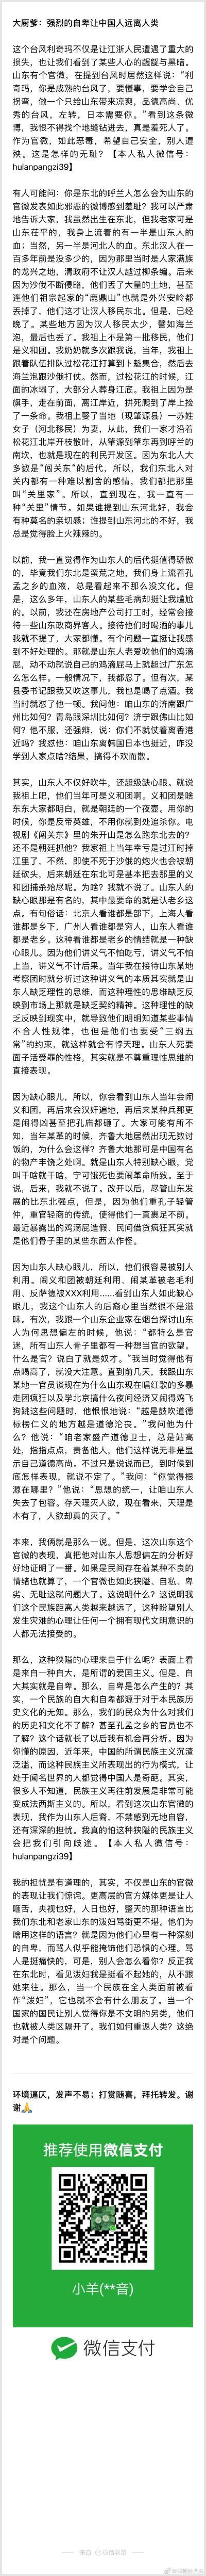 shangdong2.jpg